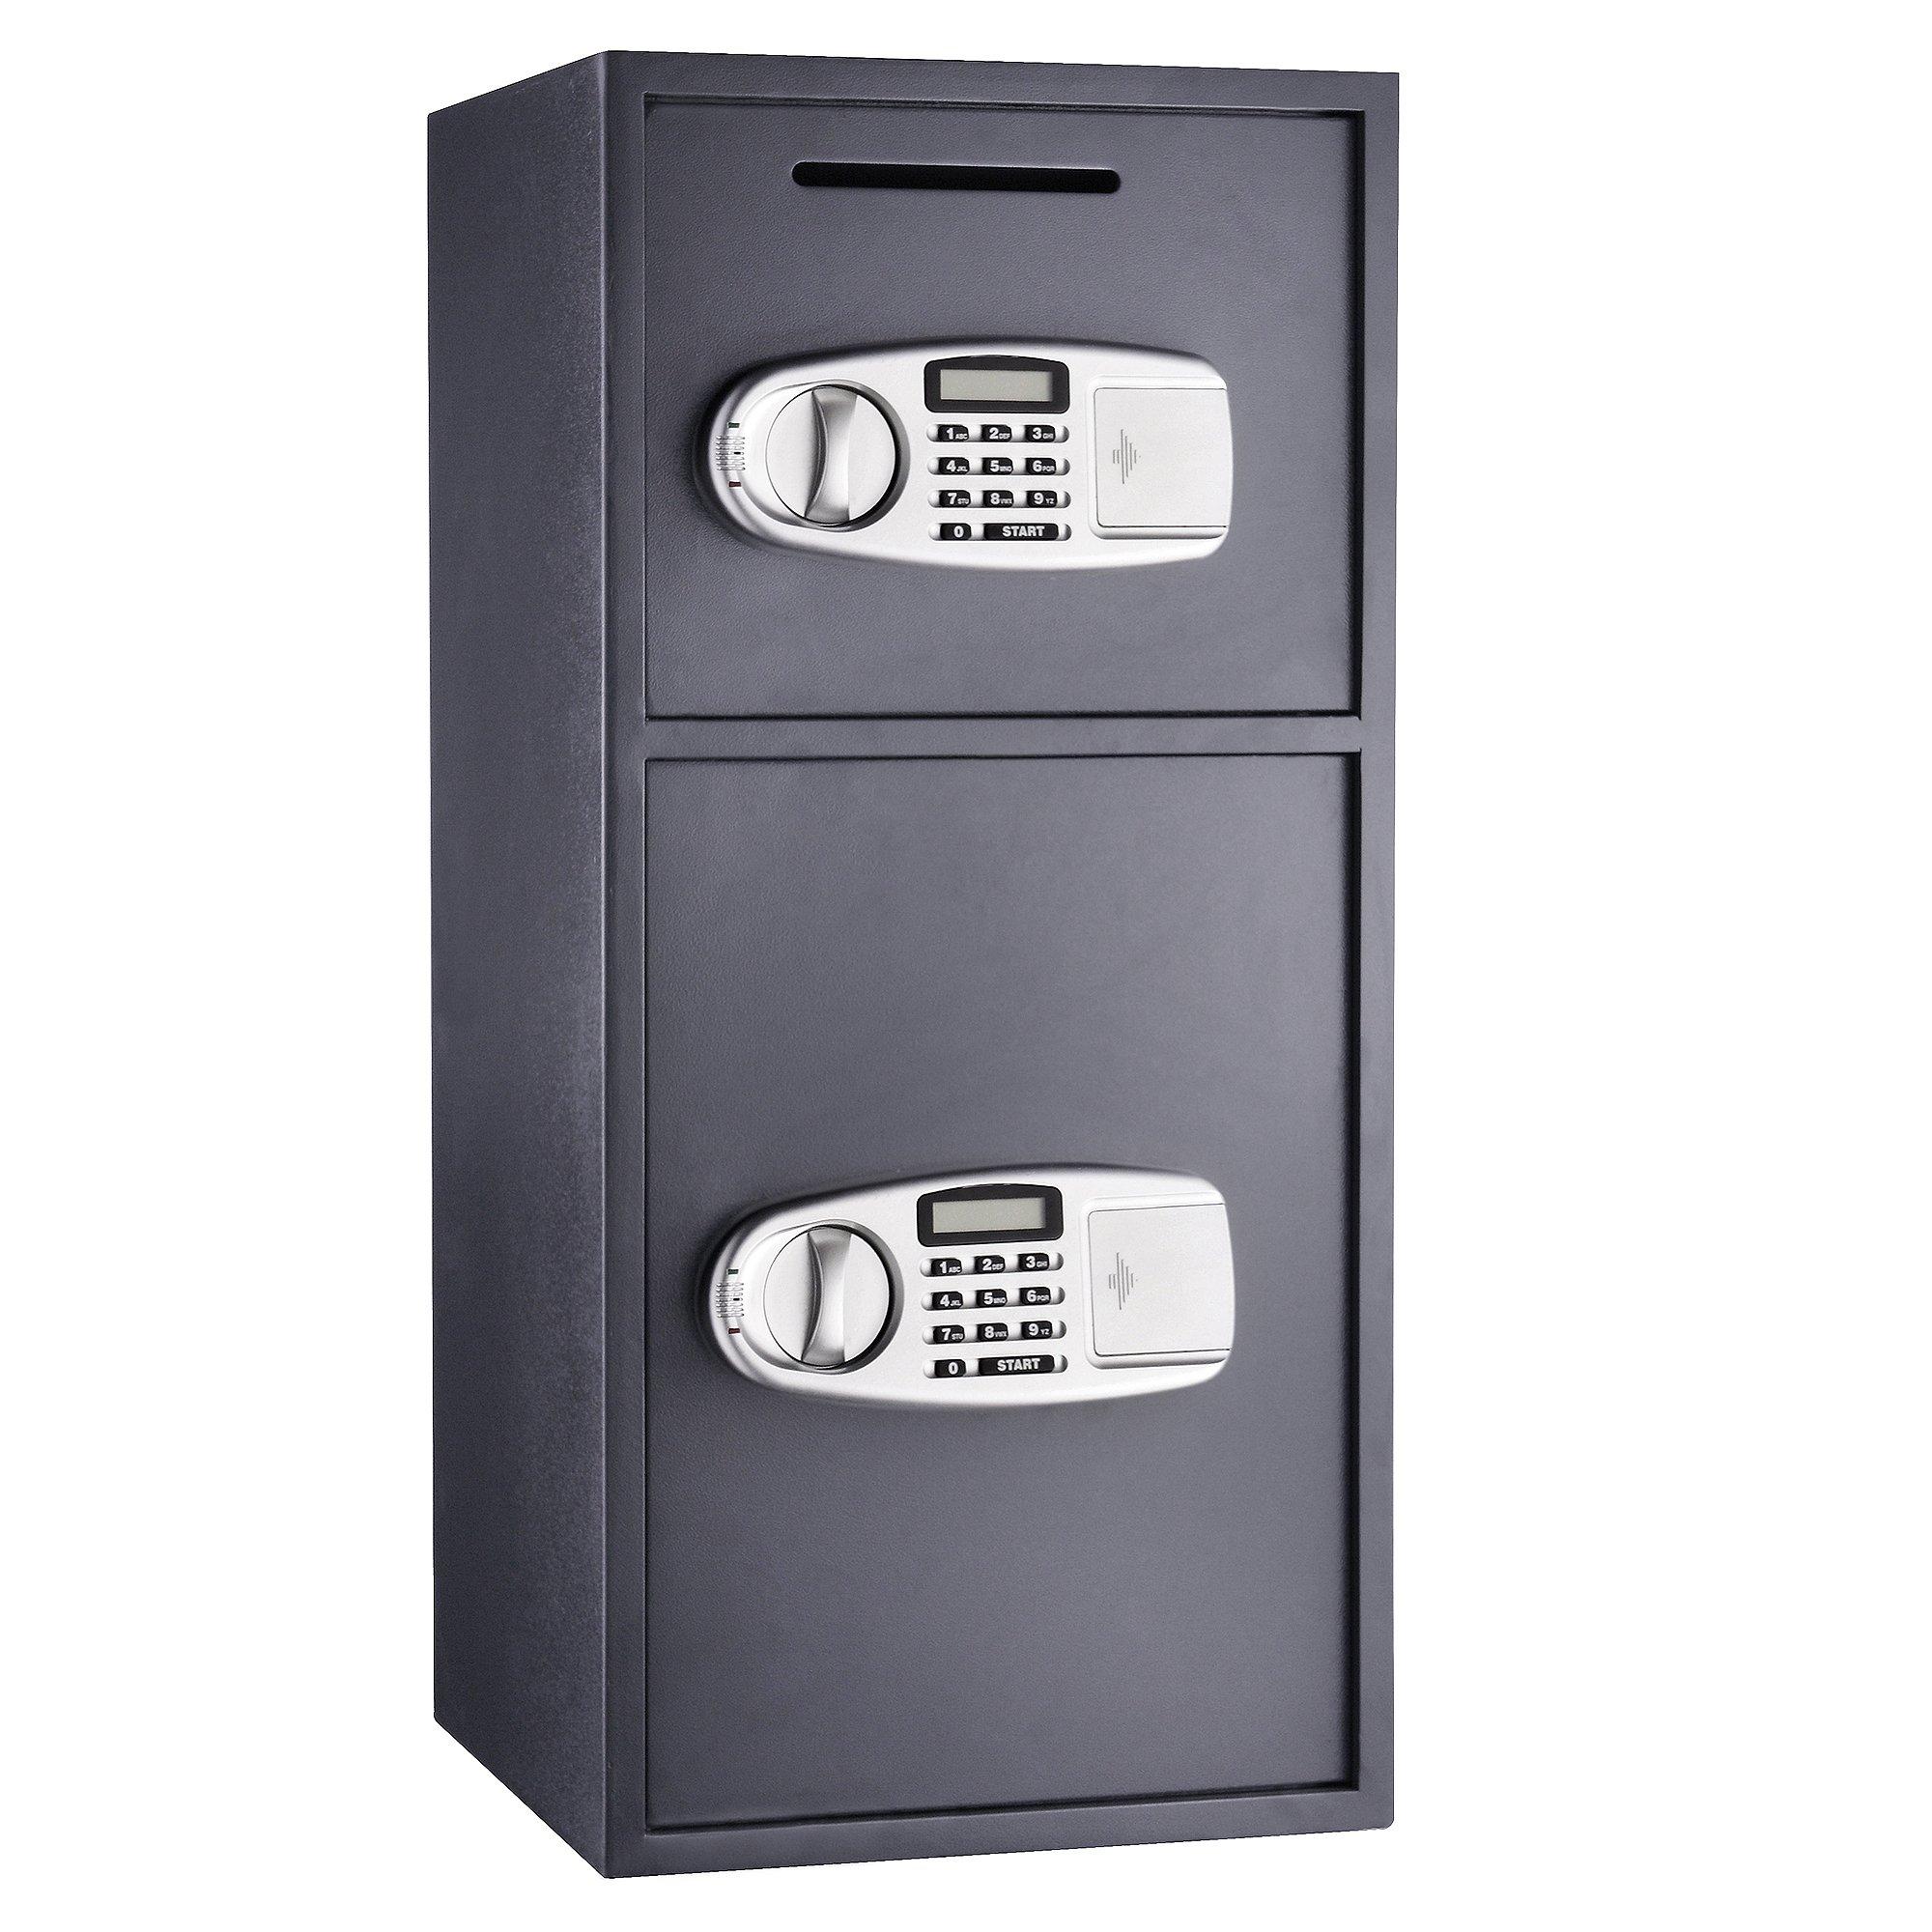 Paragon 7900 Double Door Digital Depository 3.16 CF Lock and Safe Cash Drop Security